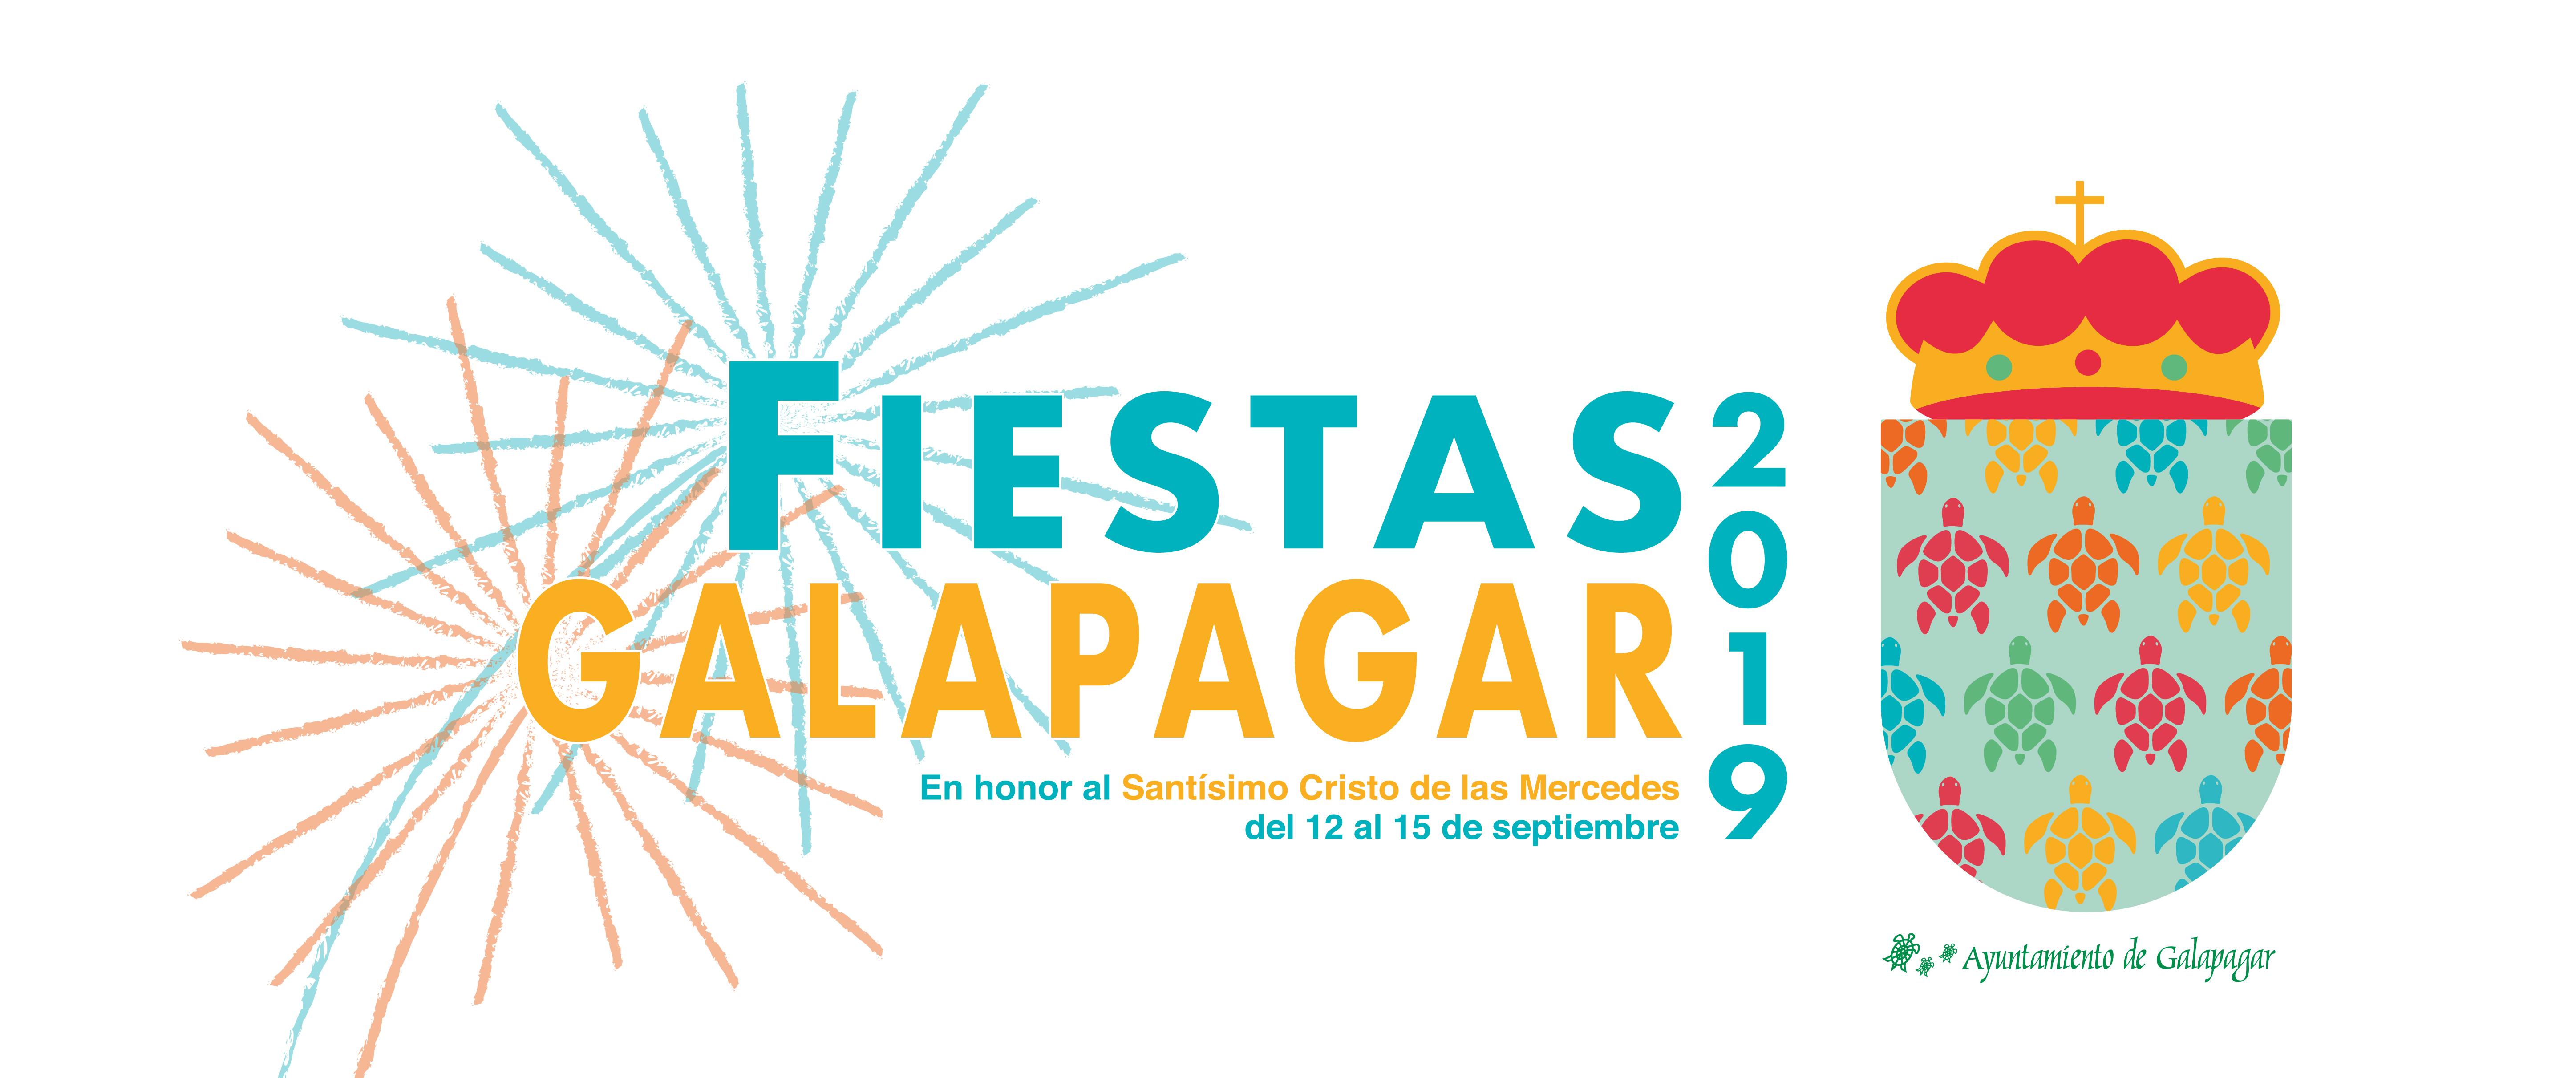 web_fiestas_galapagar_2019